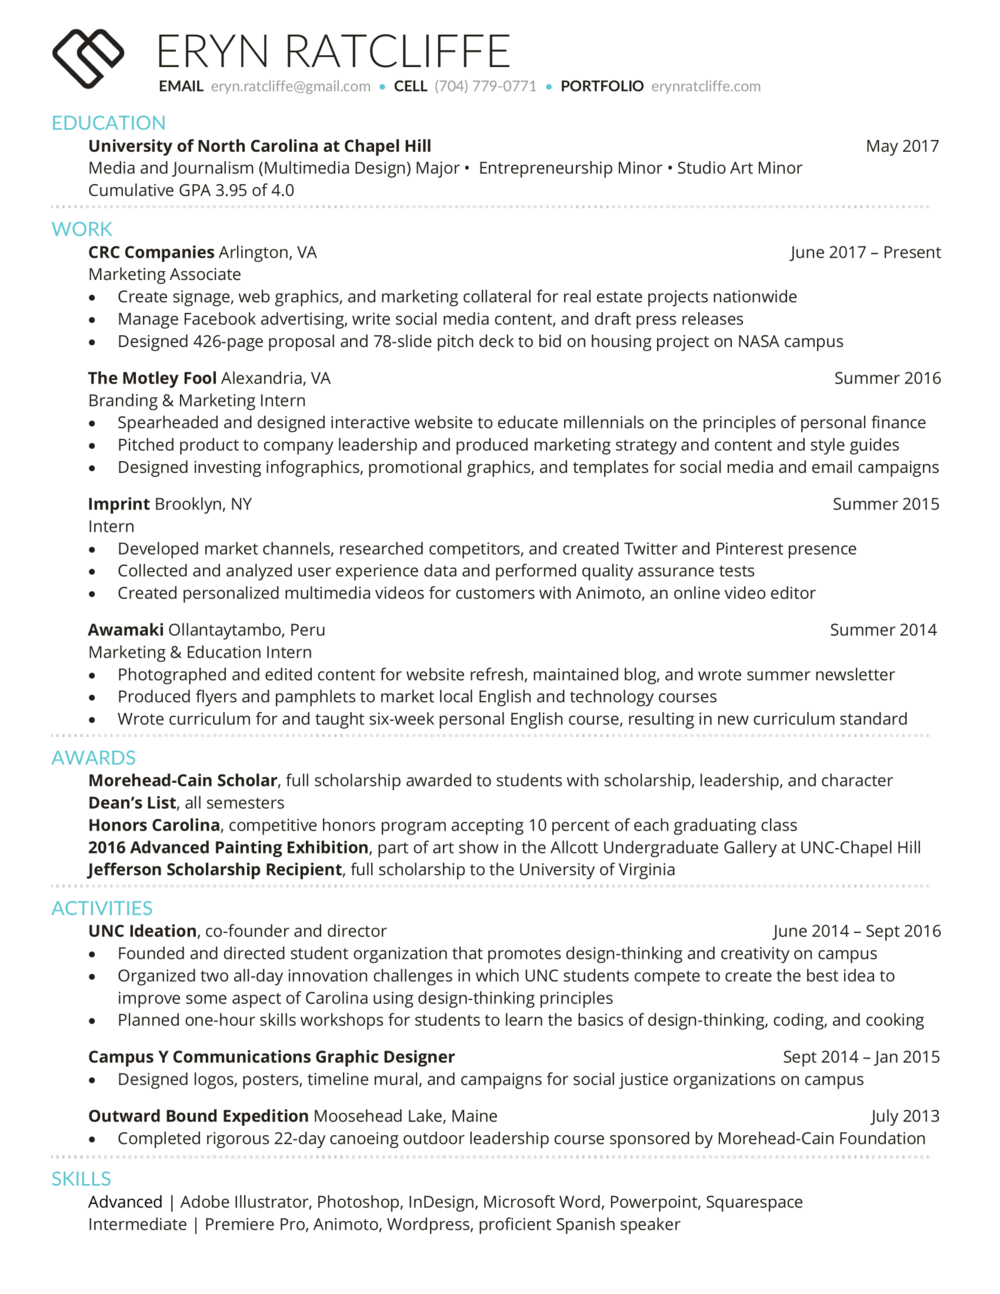 Resume — Eryn Ratcliffe